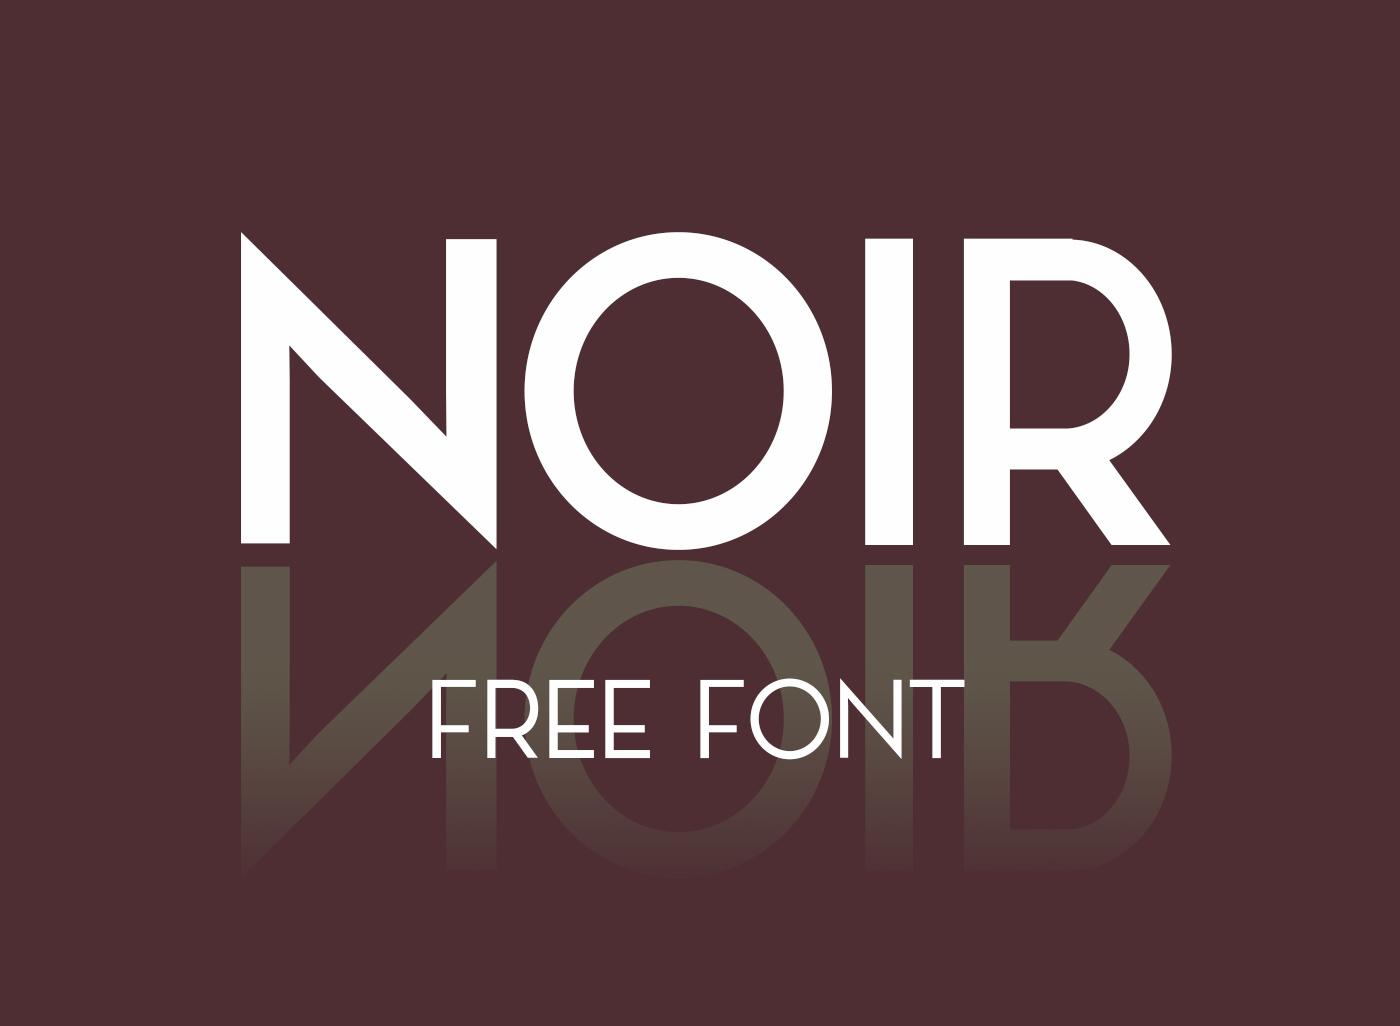 NOIR Free Typeface - Free Fonts